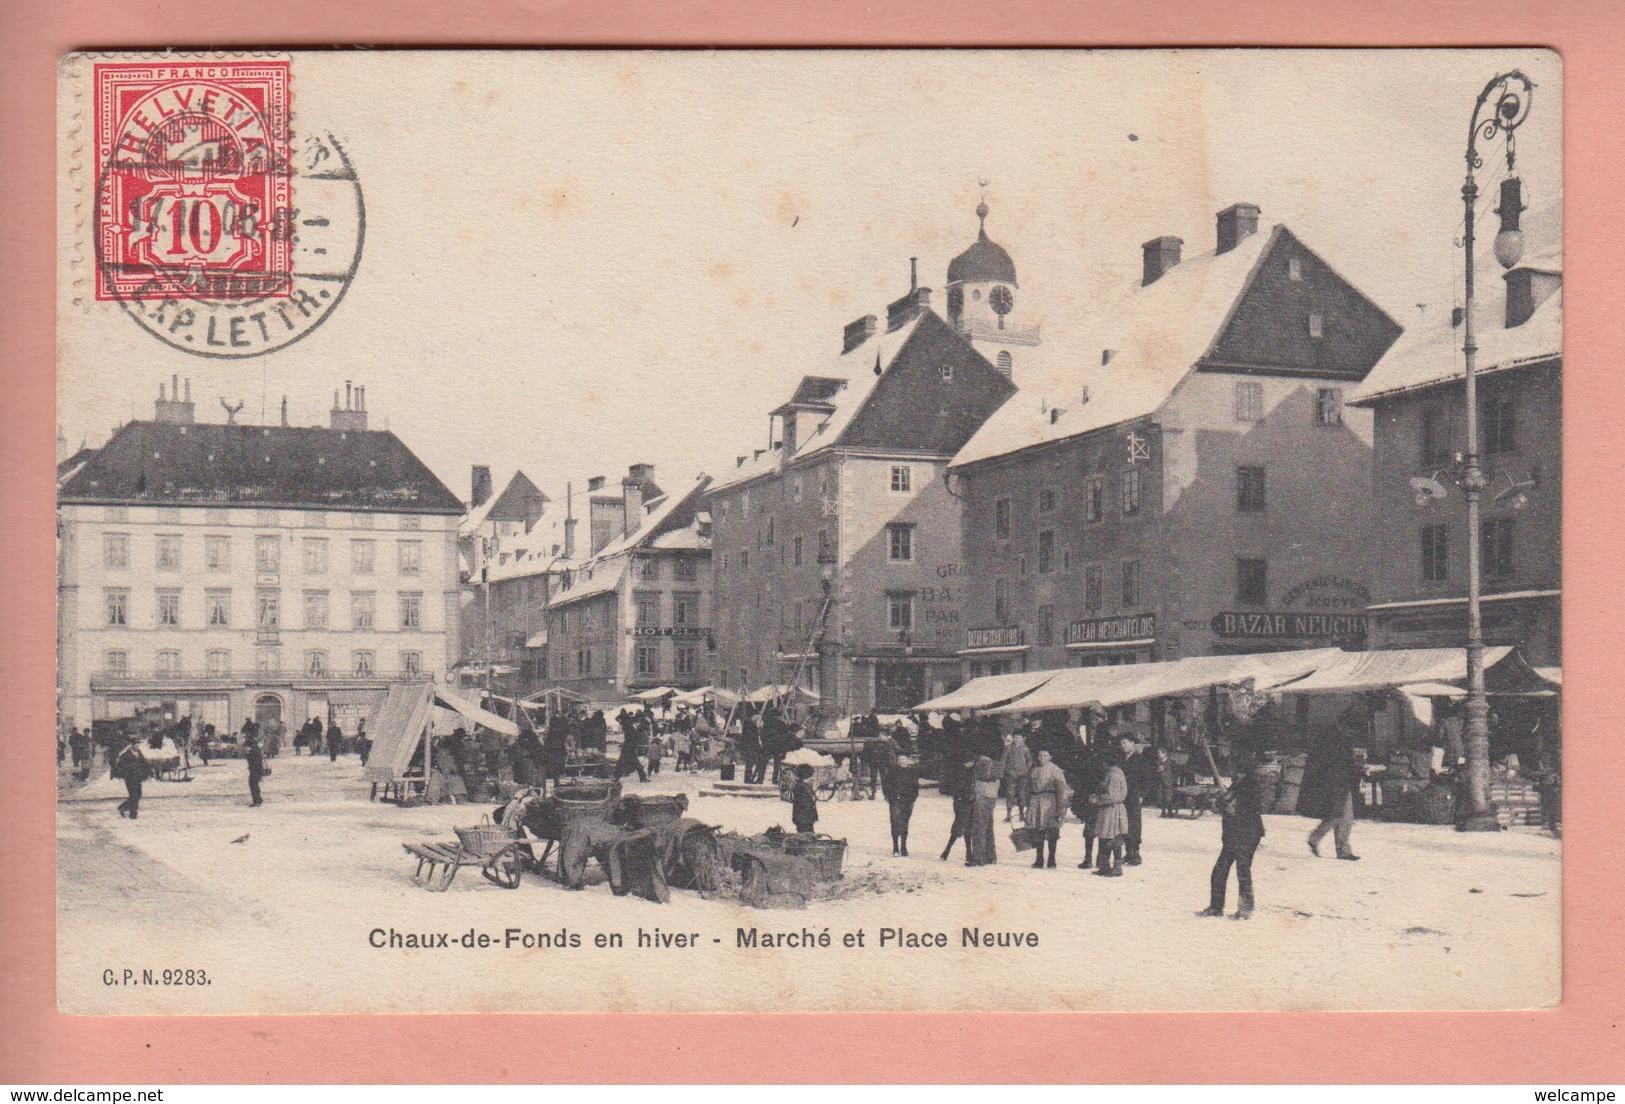 OUDE POSTKAART ZWITSERLAND - SCHWEIZ -   LA CHAUX-DE-FONDS - MARCHE  1906 - NE Neuchâtel